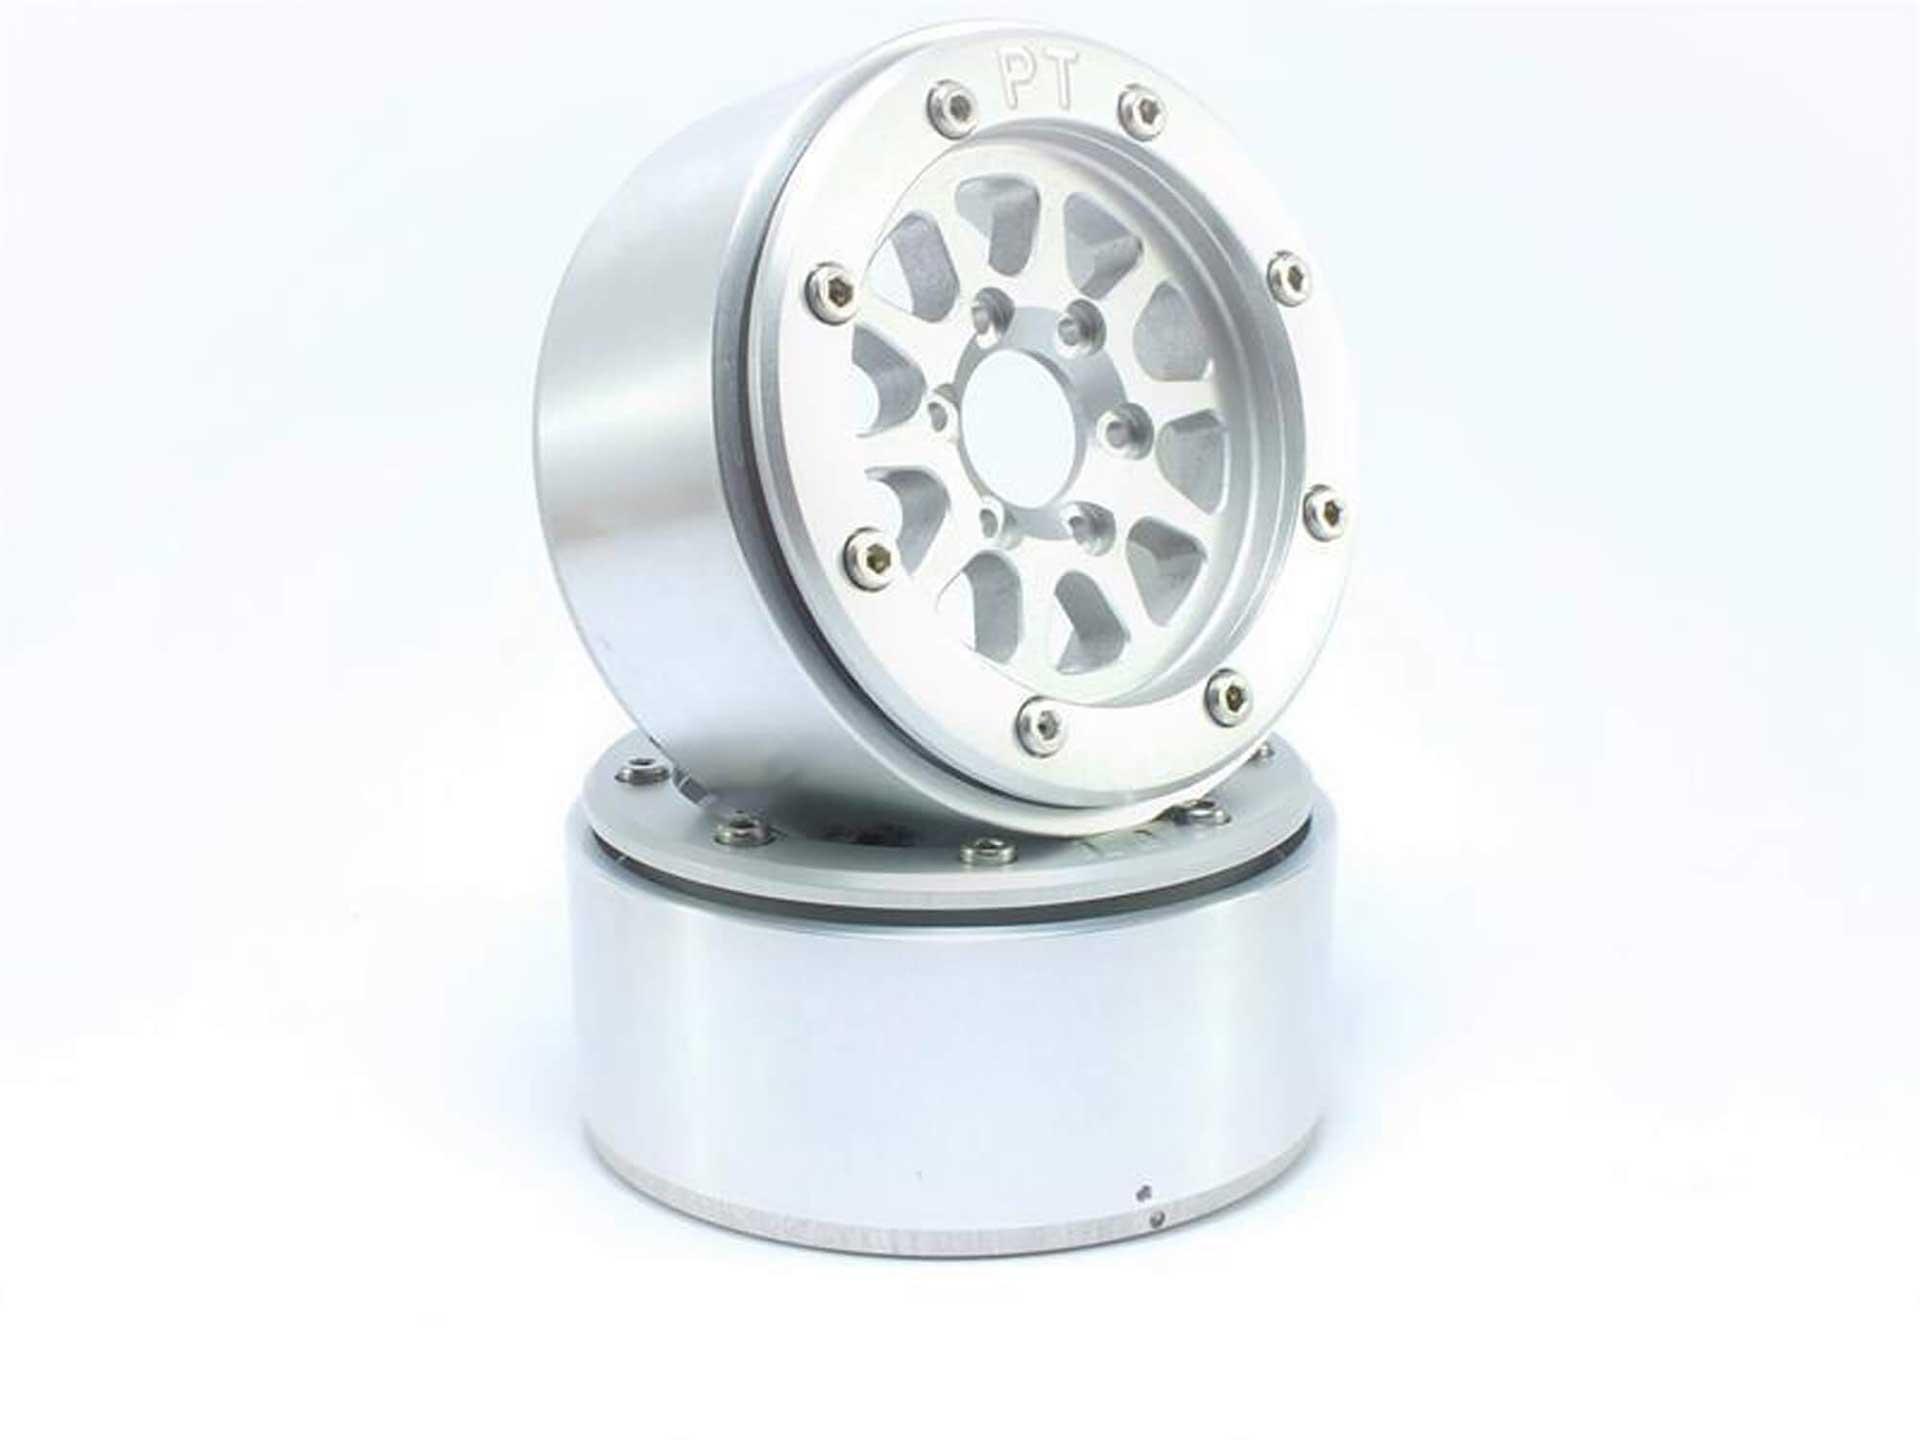 Metsafil Beadlock Wheels GEAR silber/silber 1.9 (2 St.) ohne Radnabe